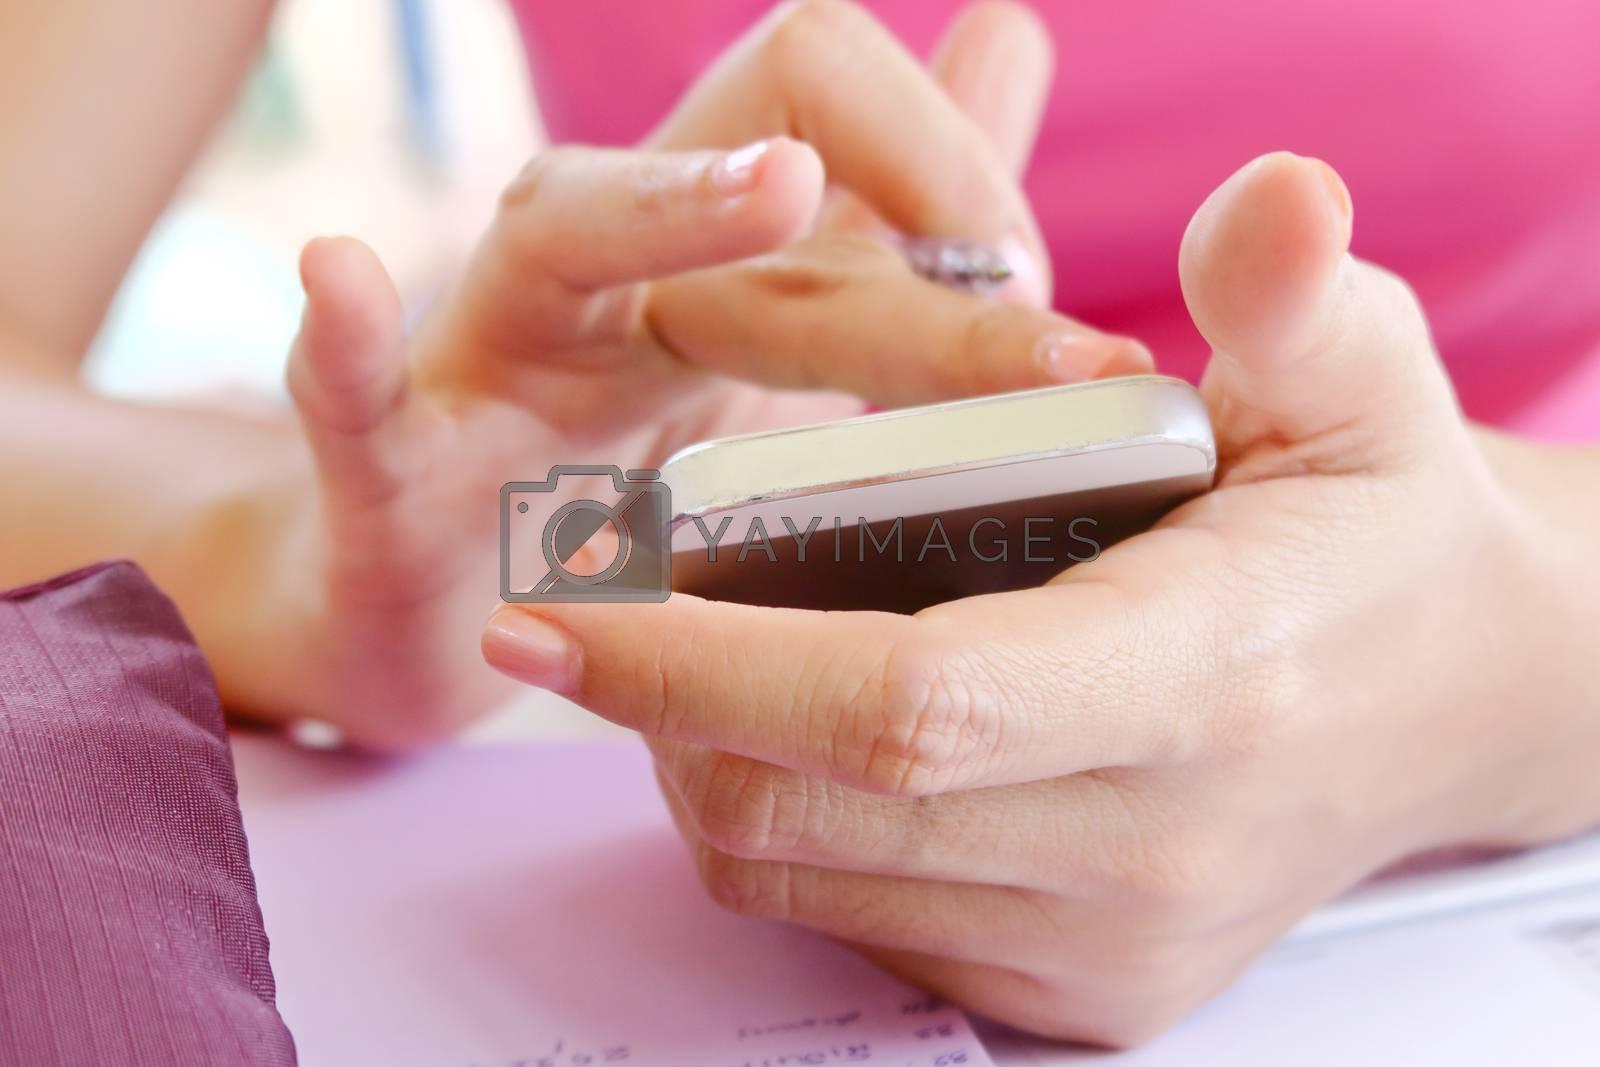 close up image of people using smart phone, communication